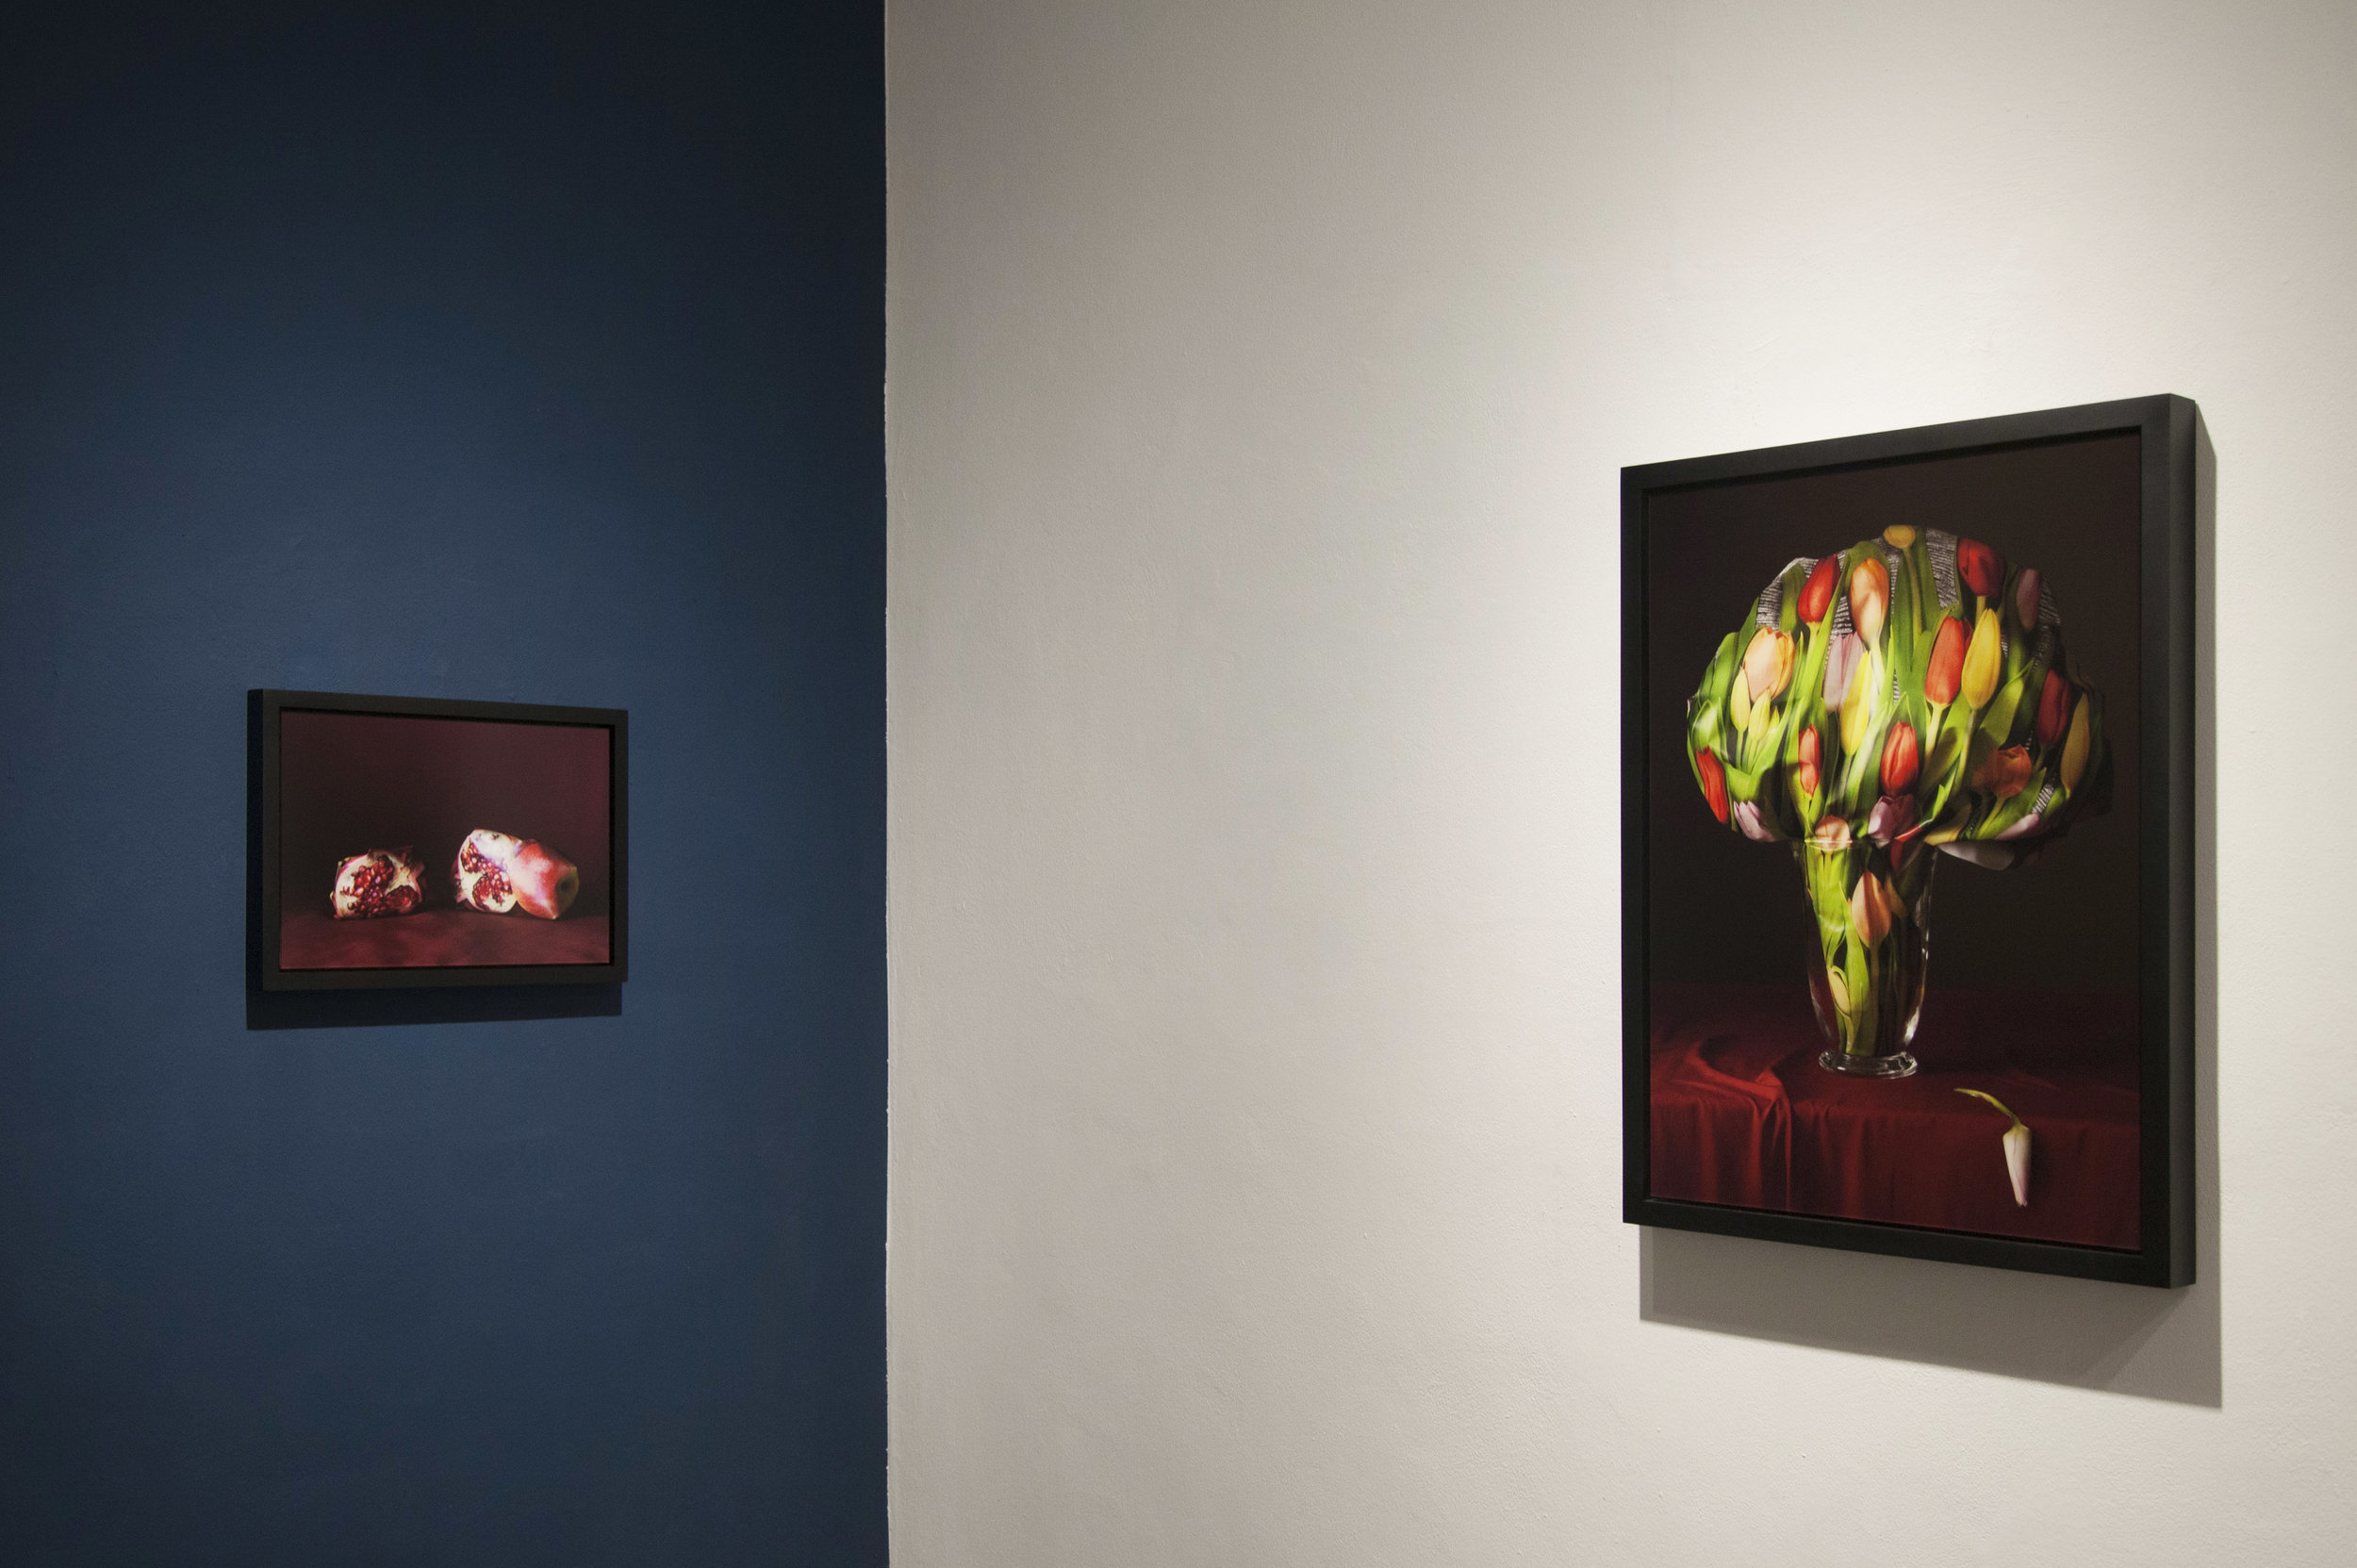 'Dark Matter' exhibition, gallery LaBottegalab, Marina di Pietrasanta, Italy 2017